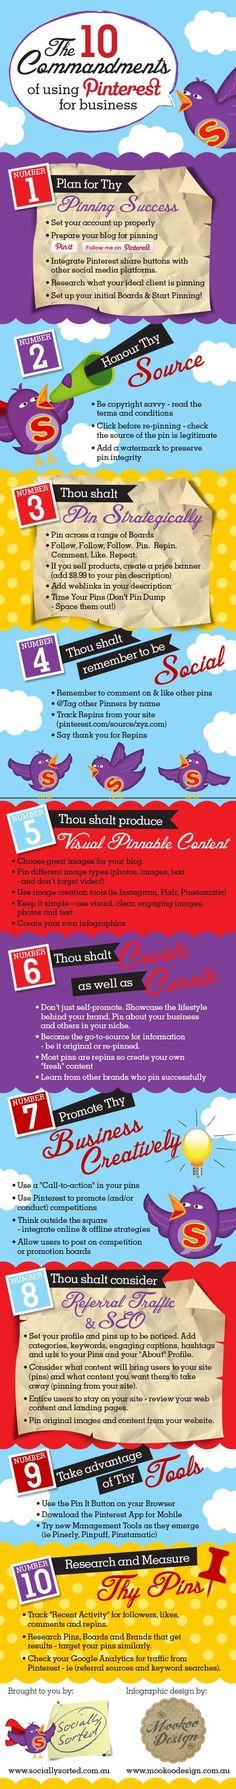 10 commandments of using Pinterest for business #Pinterest #SocialMedia #Infographic: